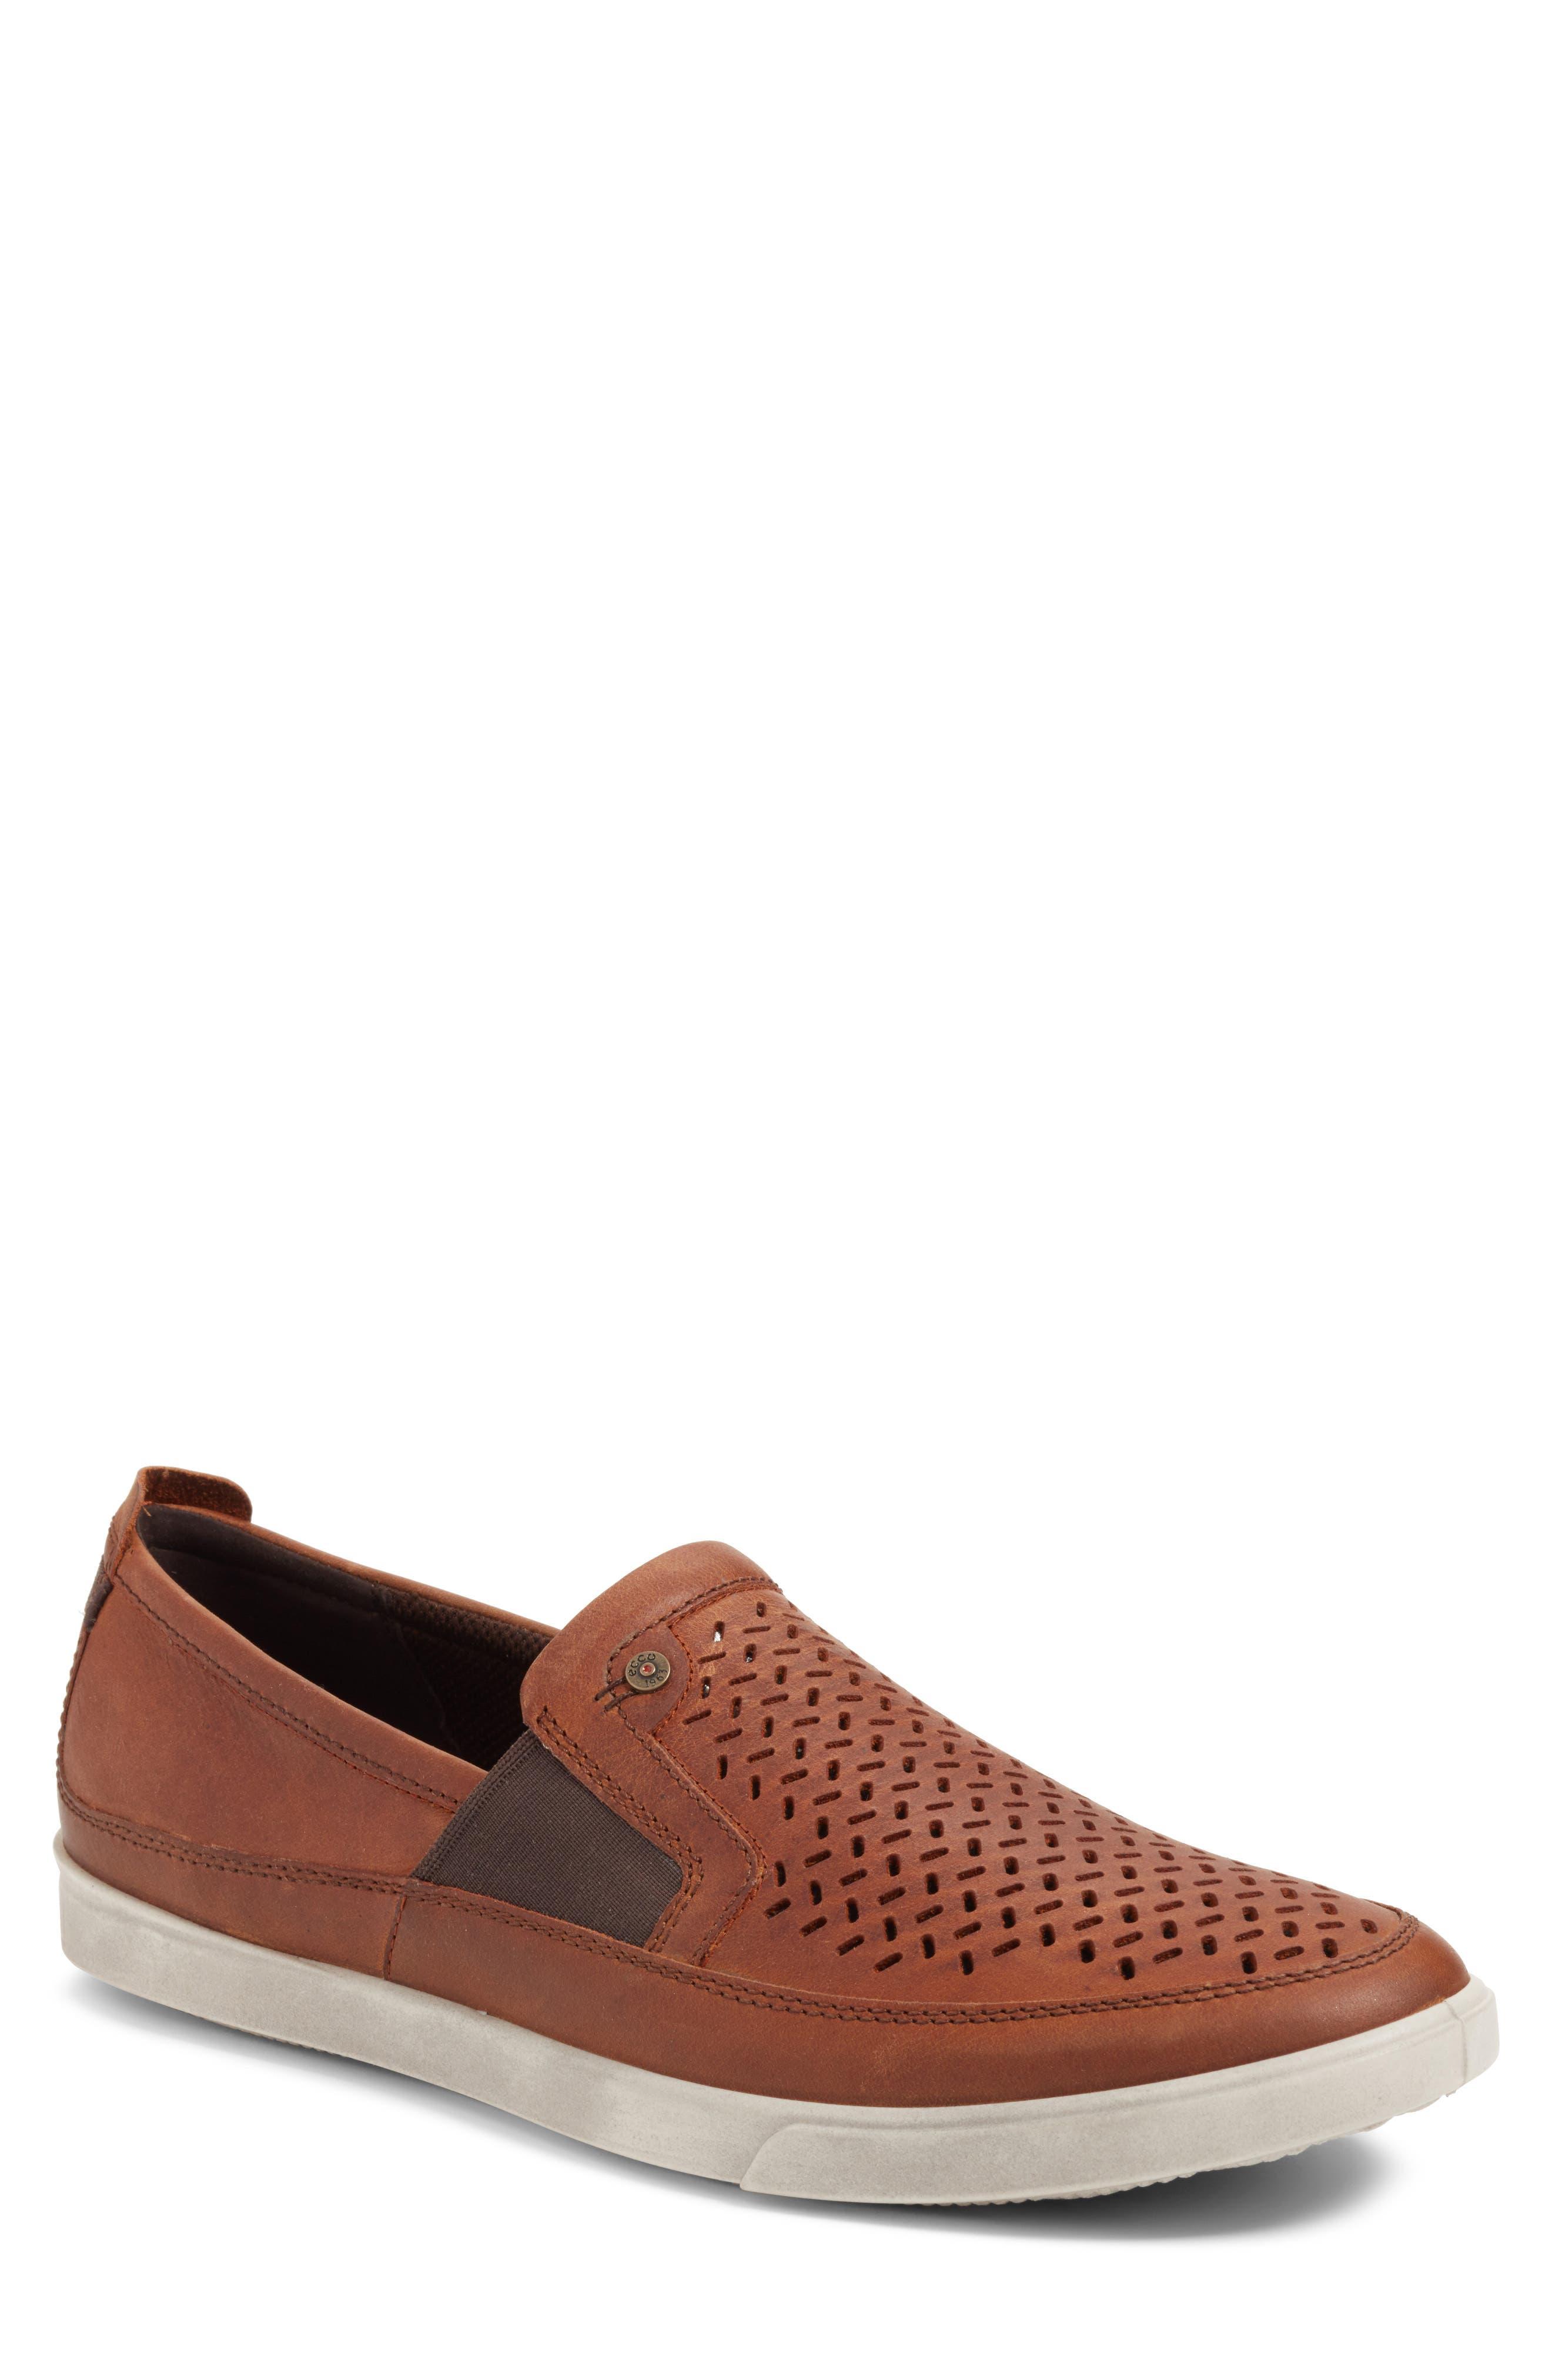 Main Image - ECCO 'Collin' Perforated Slip On Sneaker (Men)